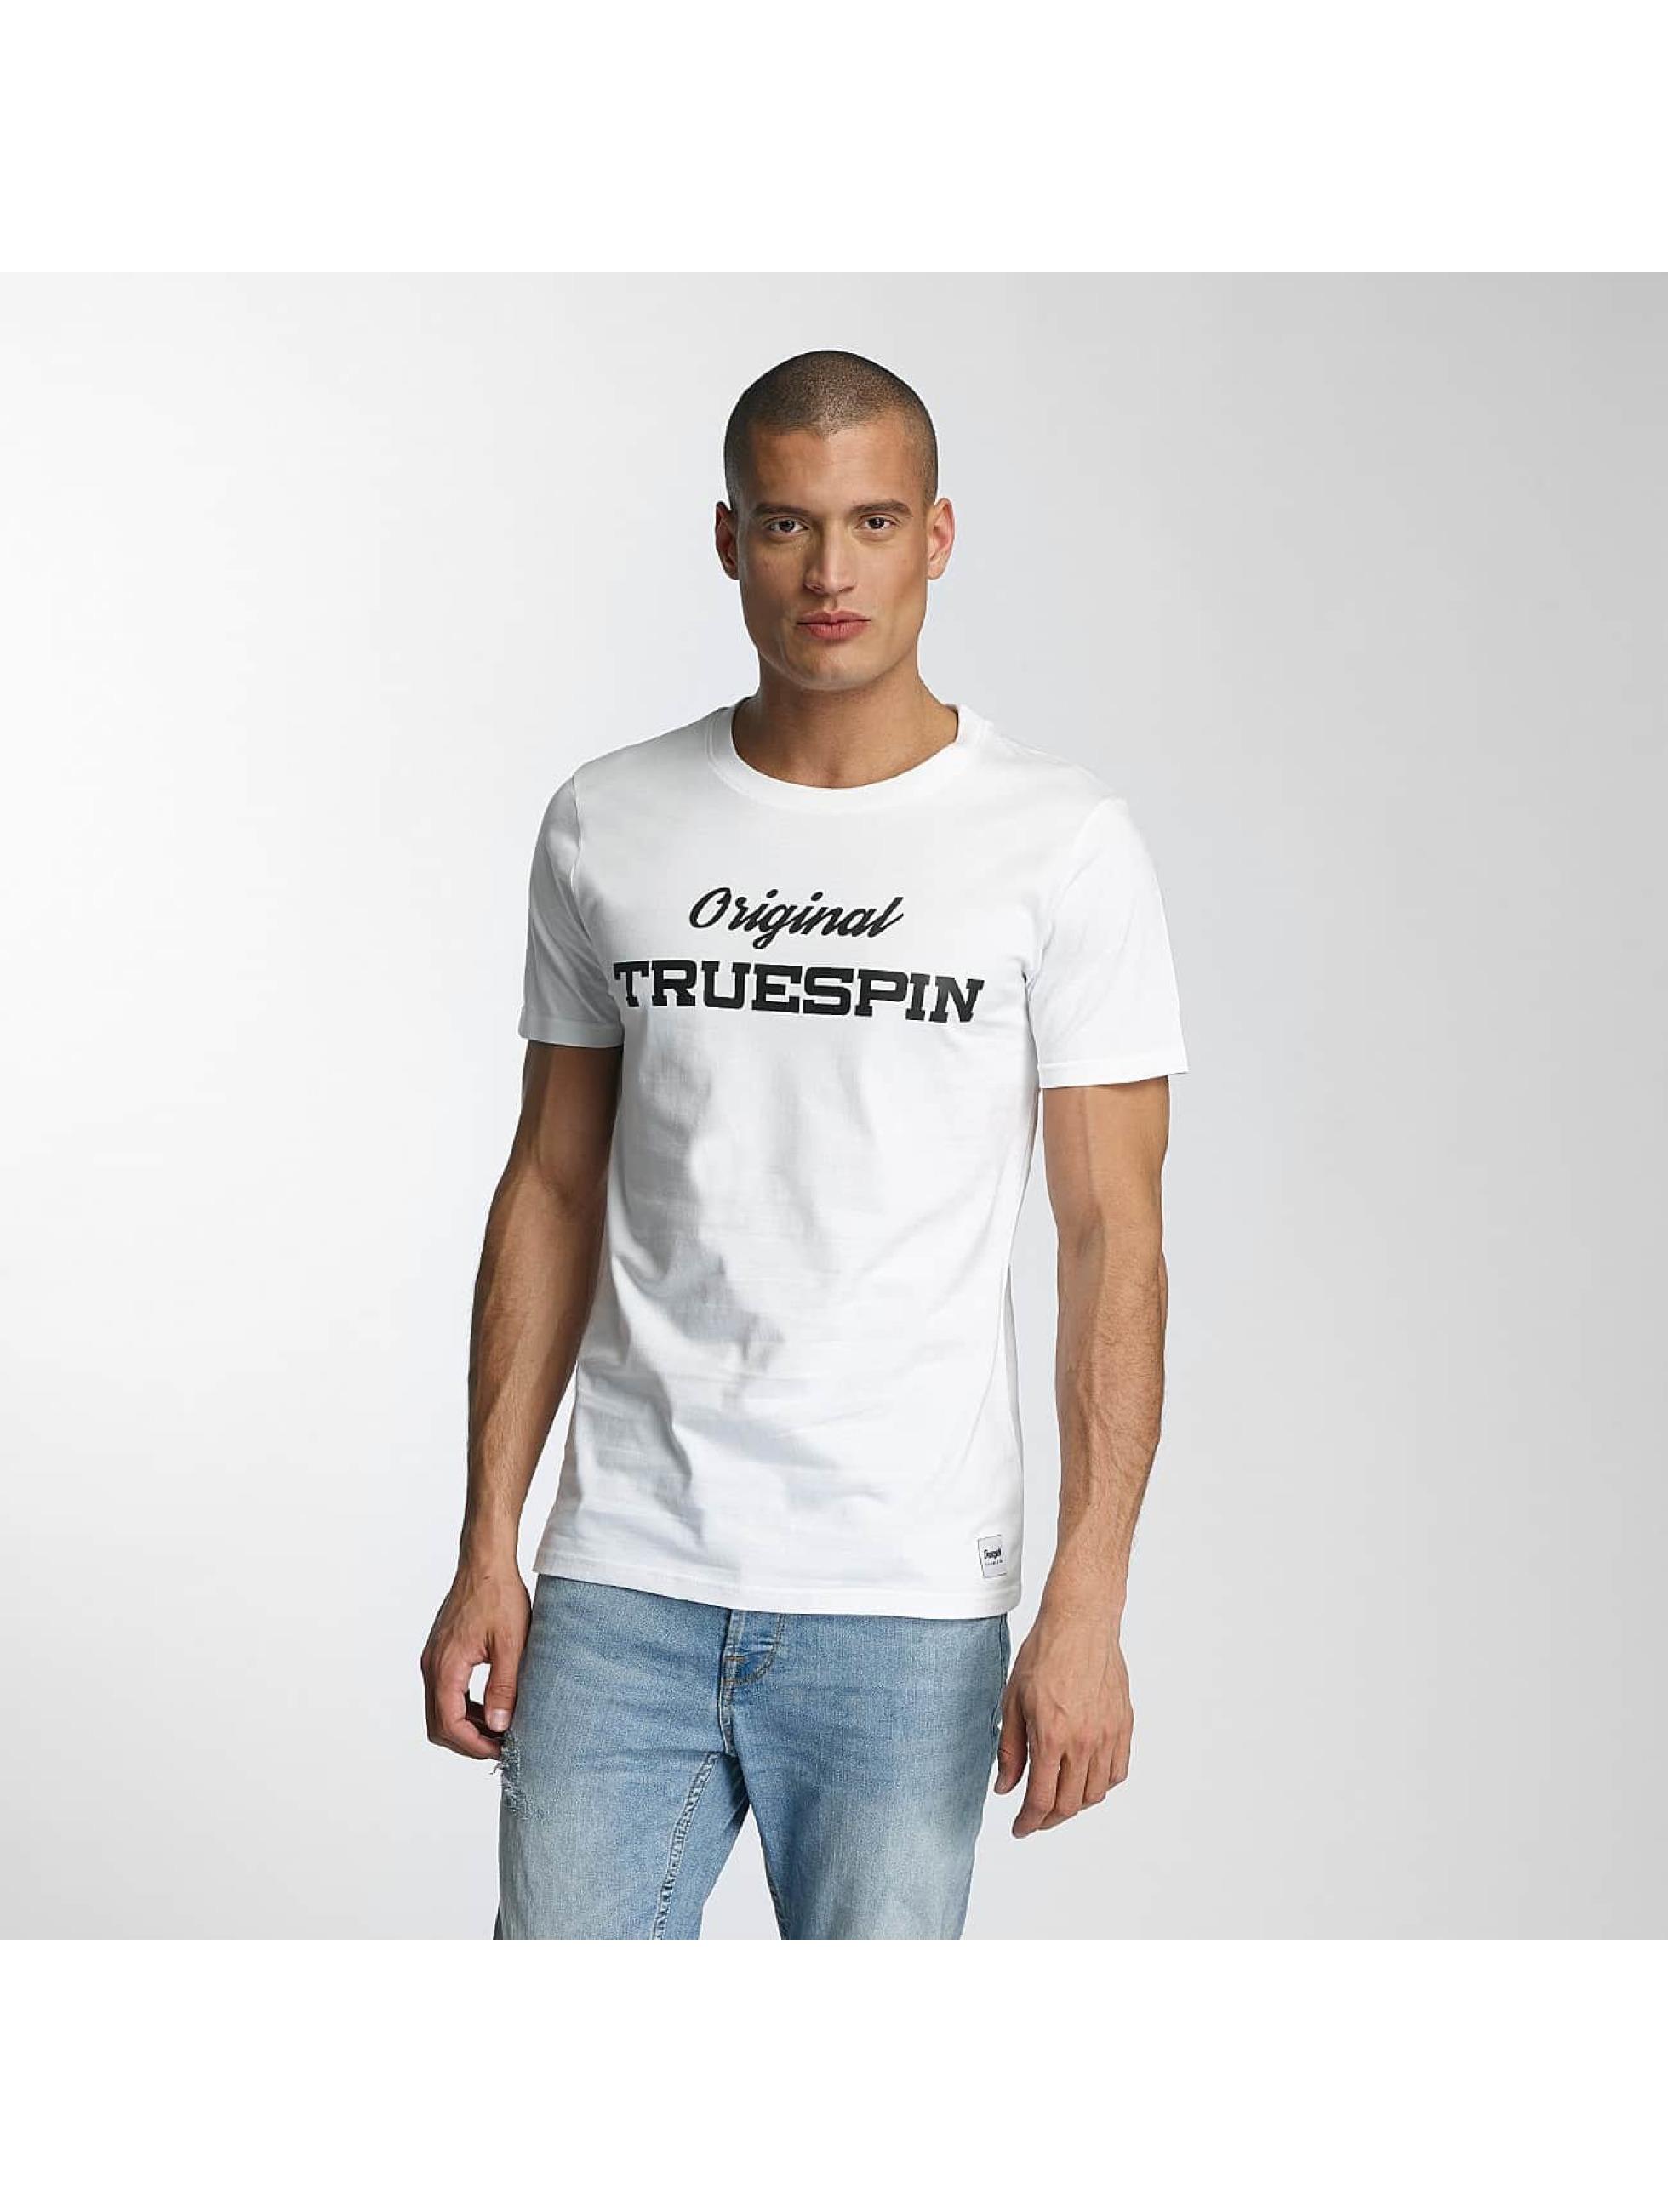 TrueSpin t-shirt 3 wit